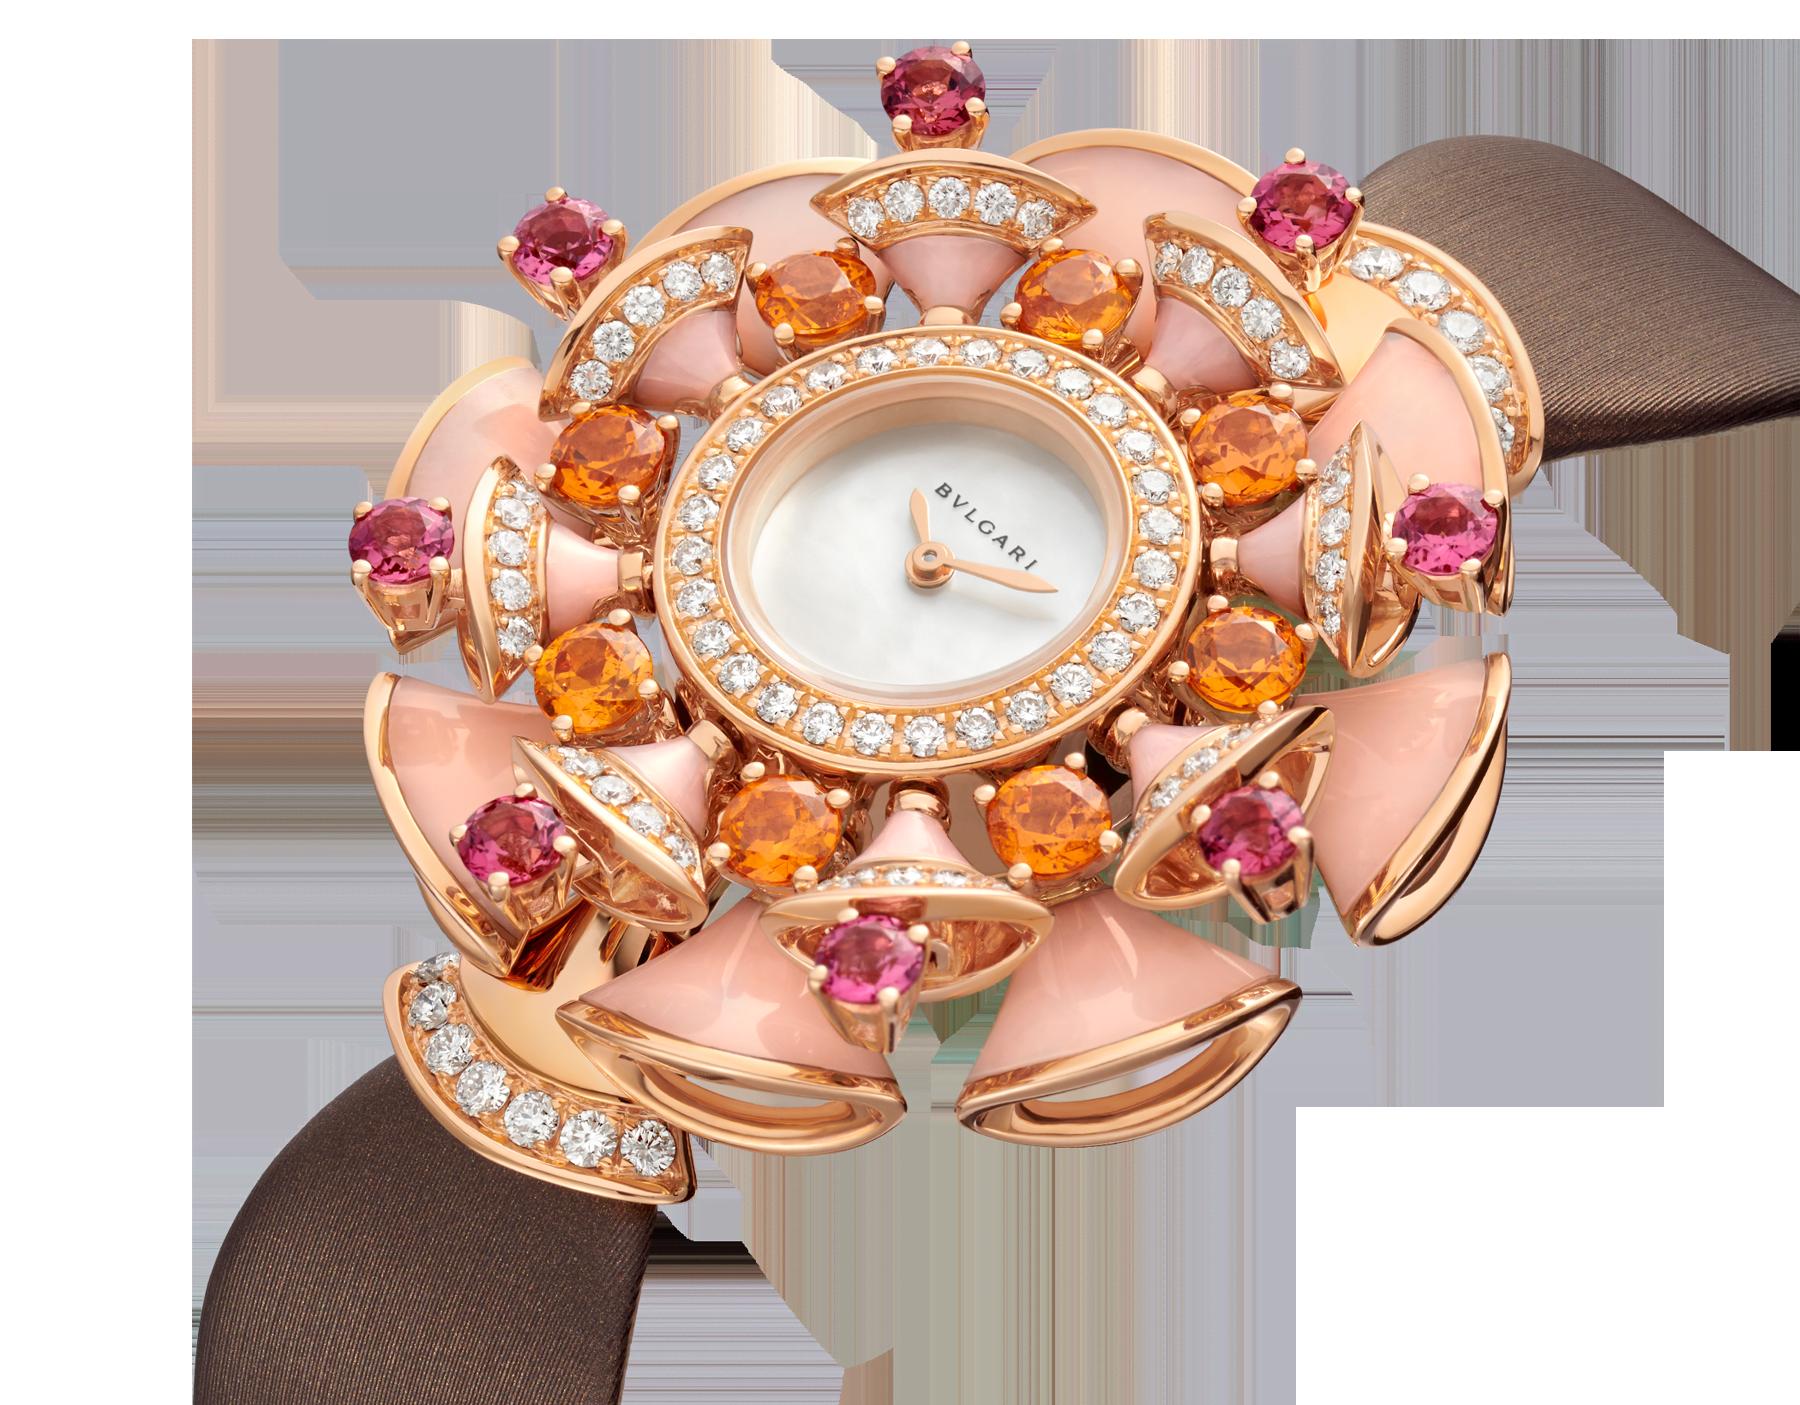 DIVAS' DREAM 腕錶,18K 玫瑰金錶殼鑲飾明亮型切割鑽石、橙色石榴石、碧璽和粉紅色蛋白石元素。白色珍珠母貝錶盤,褐灰色緞面錶帶。 102420 image 2